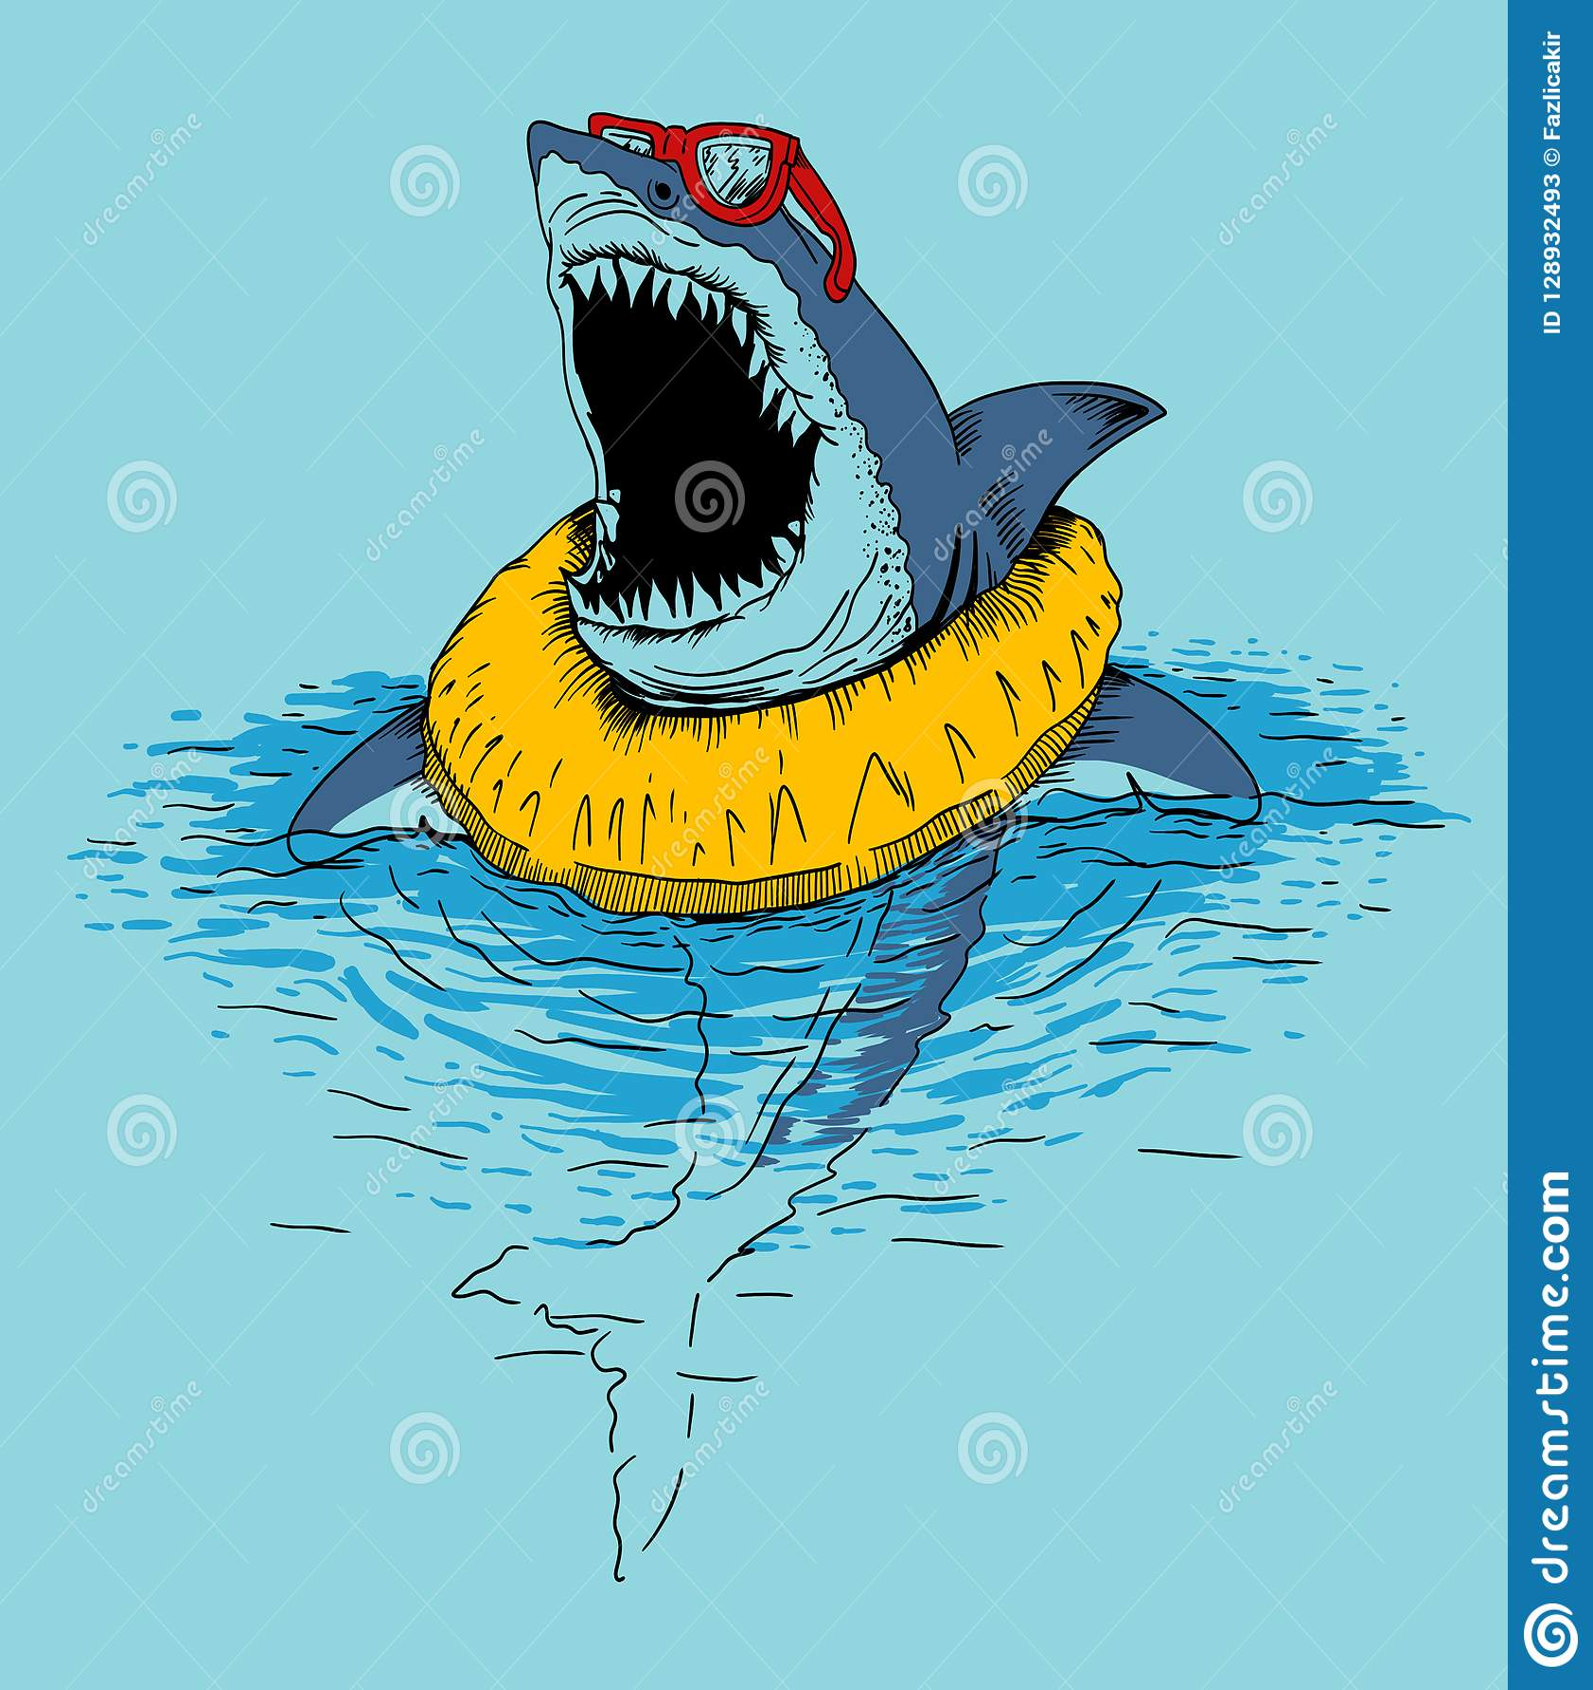 Funny shark hand drawn illustration for kids t shirt print design